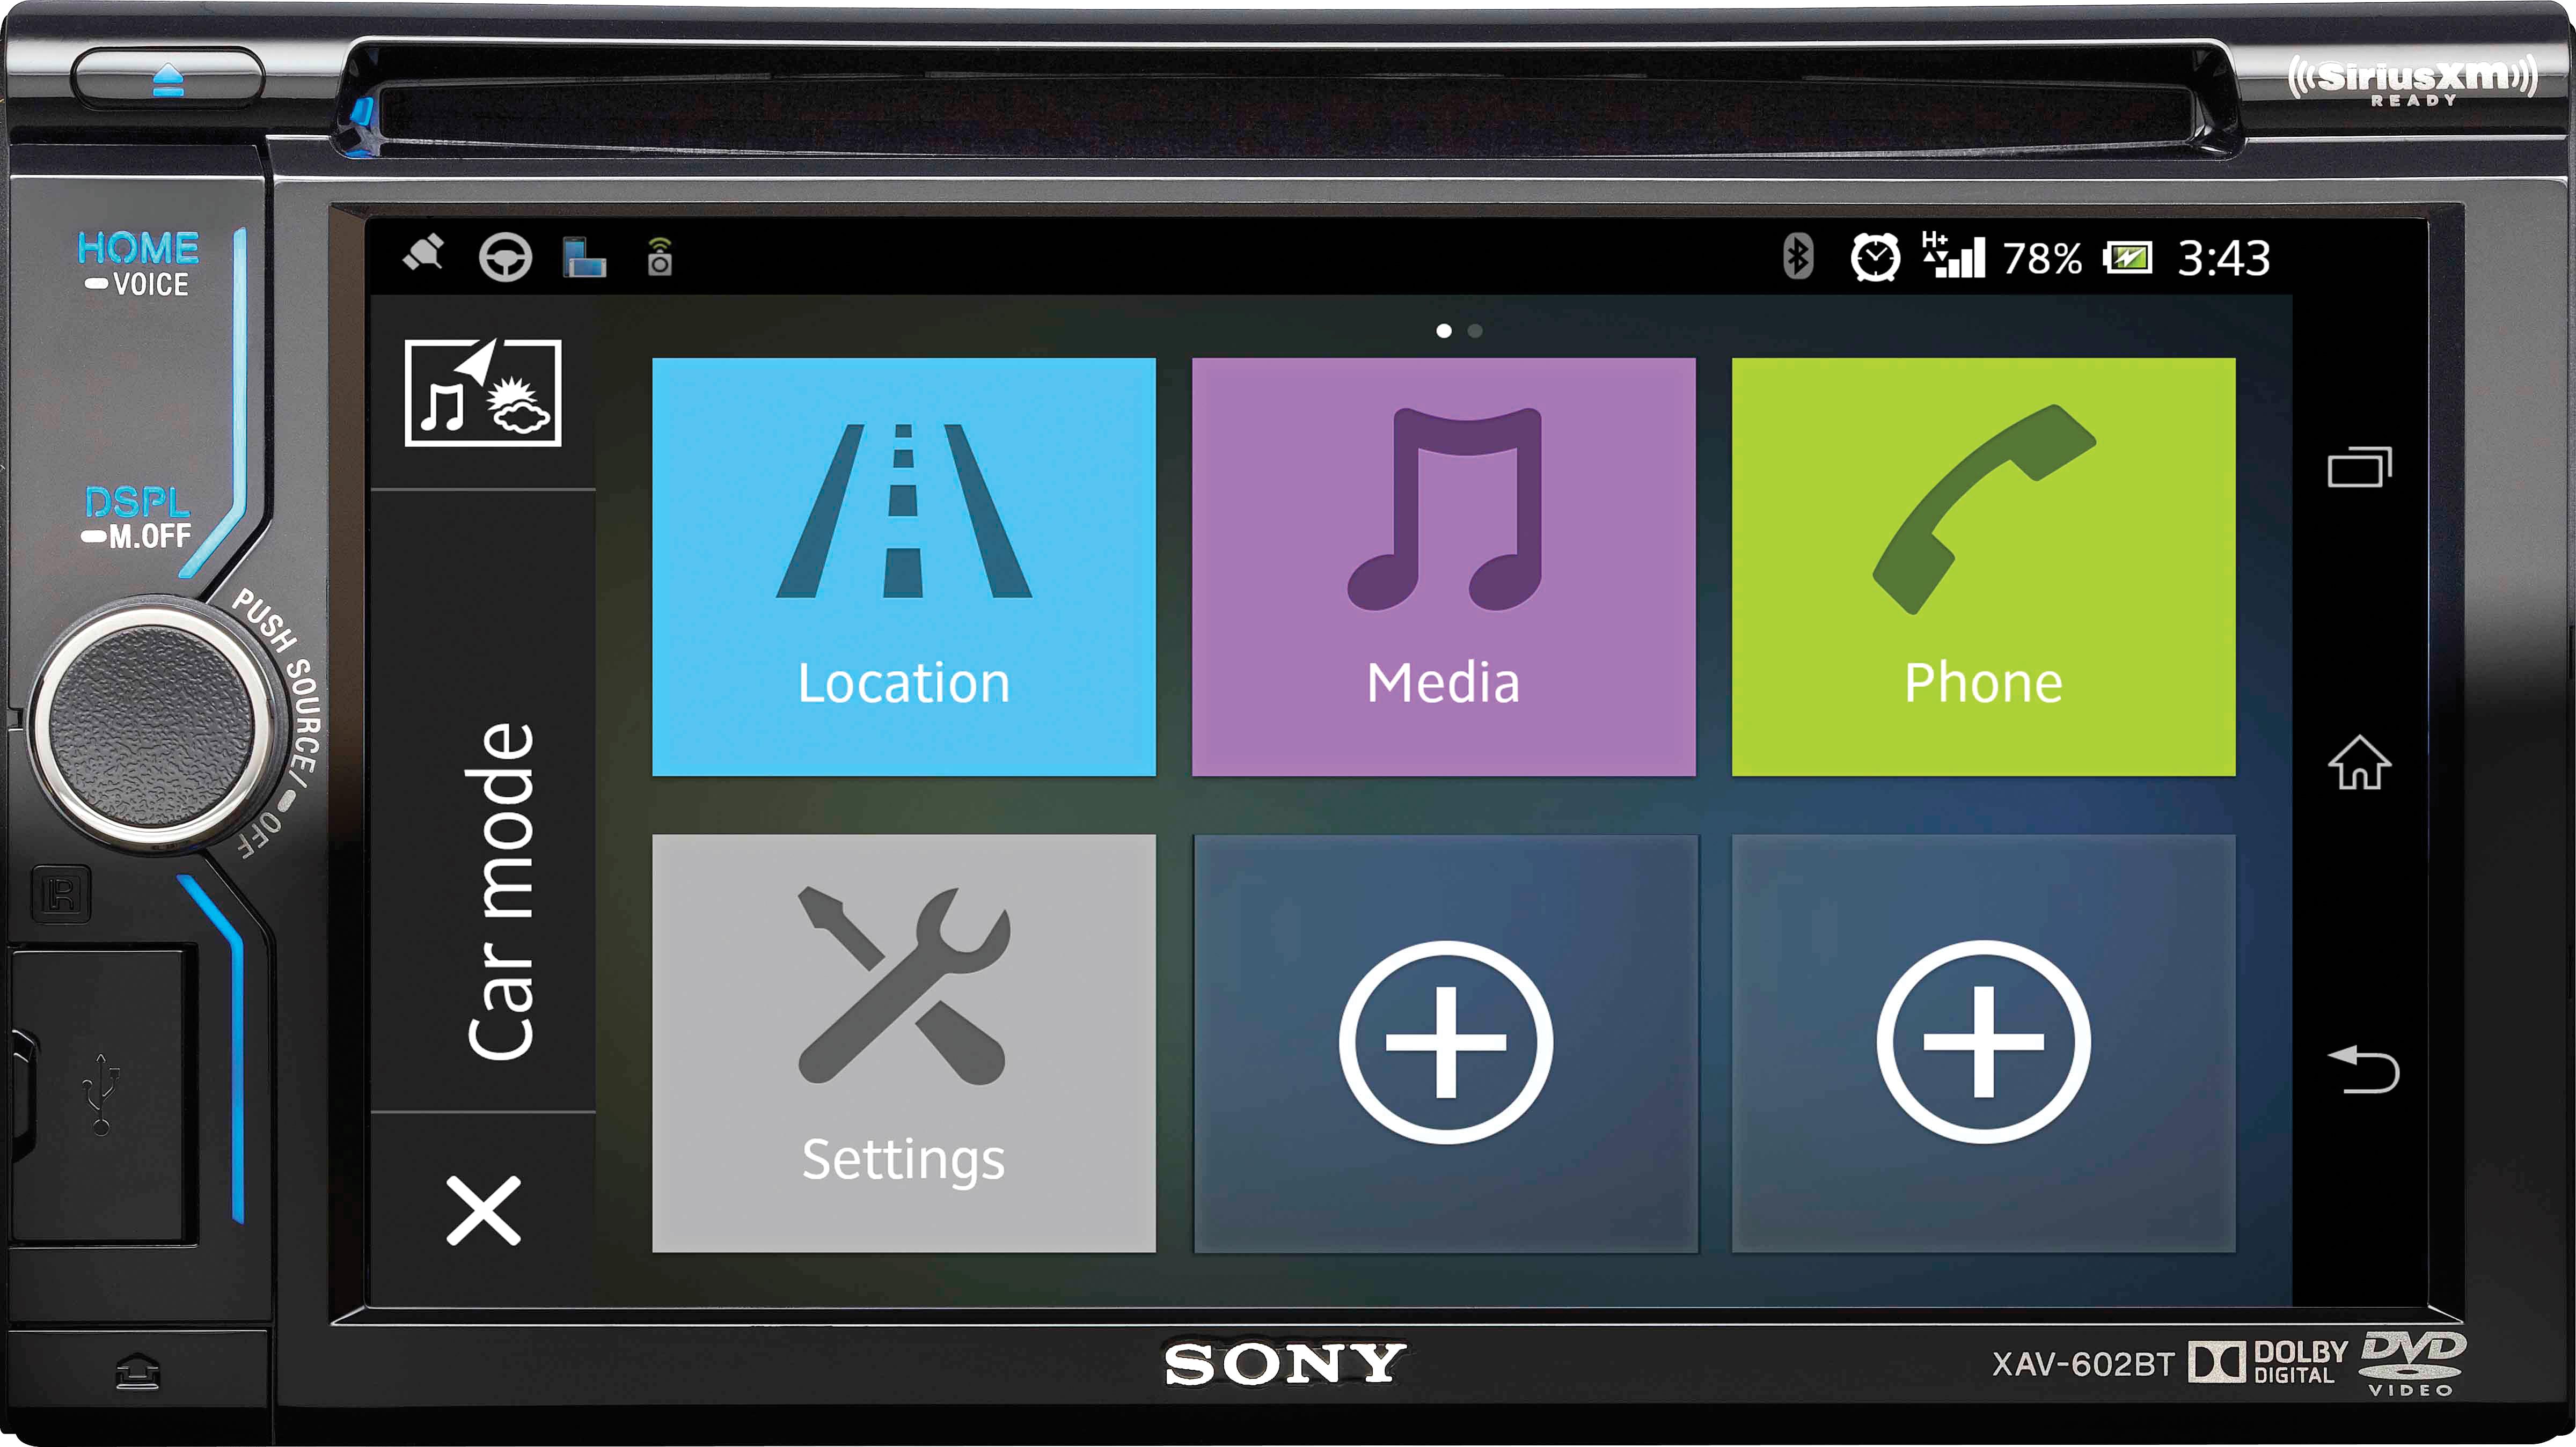 PASMAG | PERFORMANCE AUTO AND SOUND - SONY XAV-602BT Multimedia